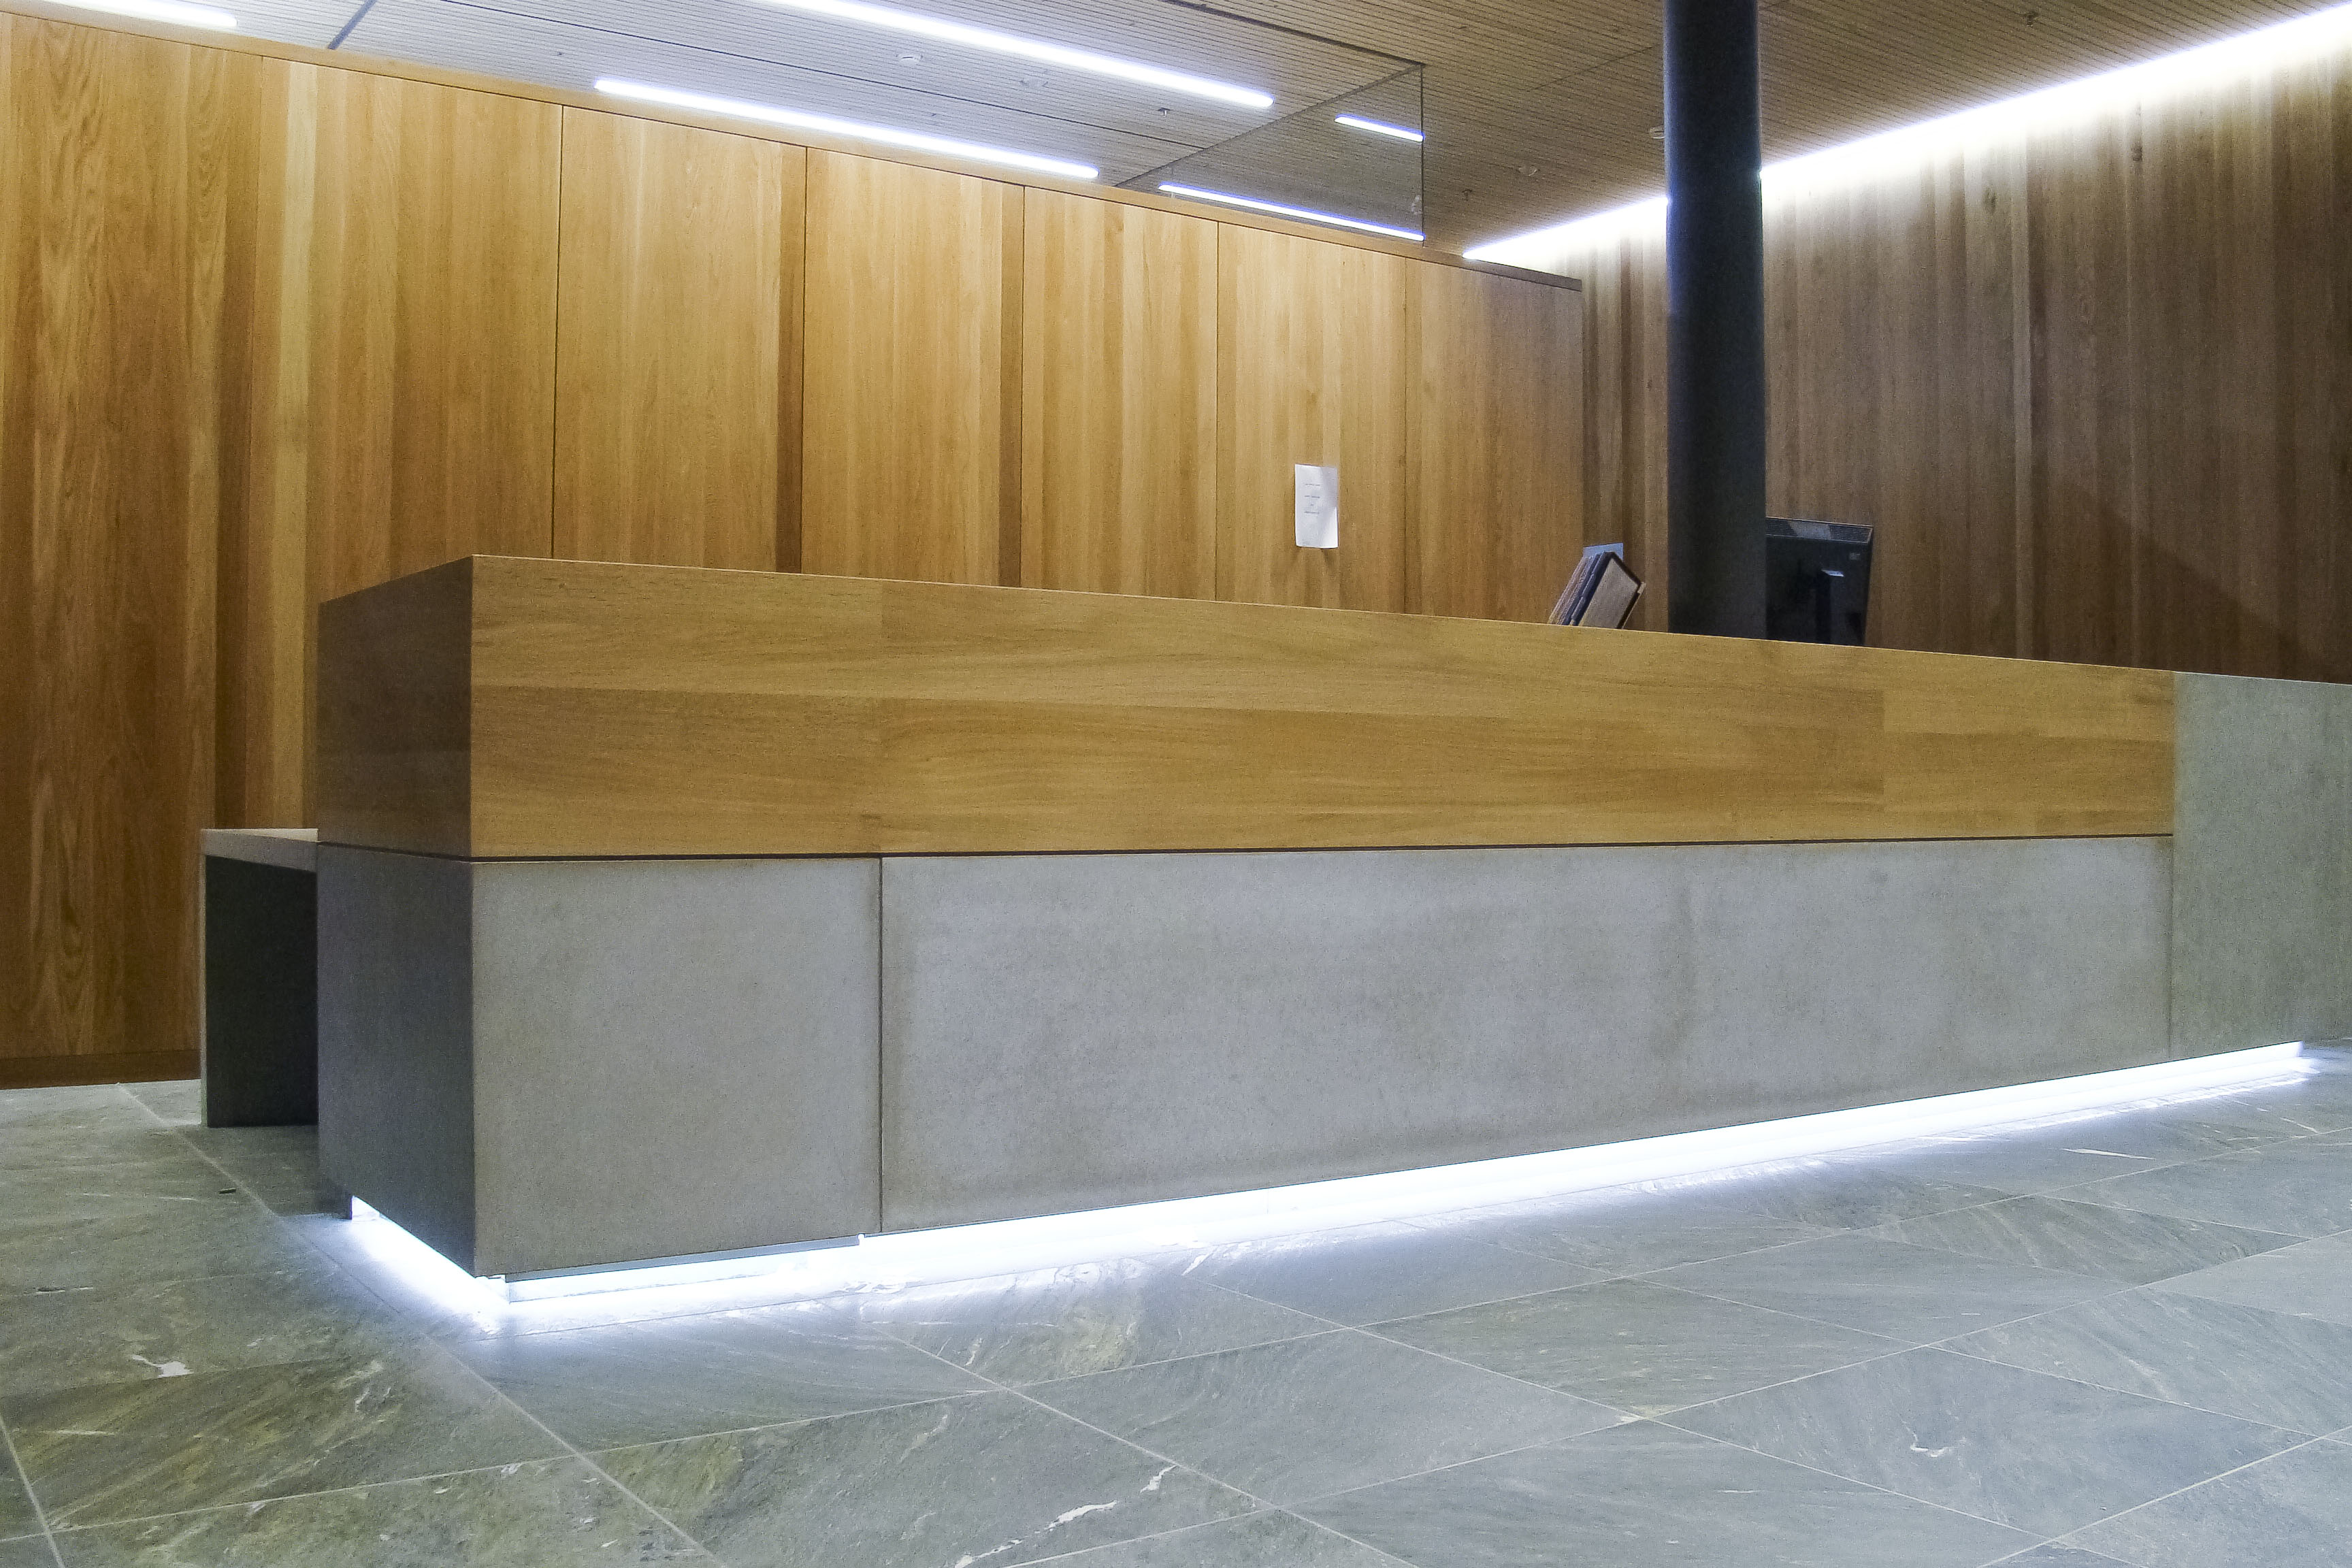 dade design concrete works betonk chen und. Black Bedroom Furniture Sets. Home Design Ideas